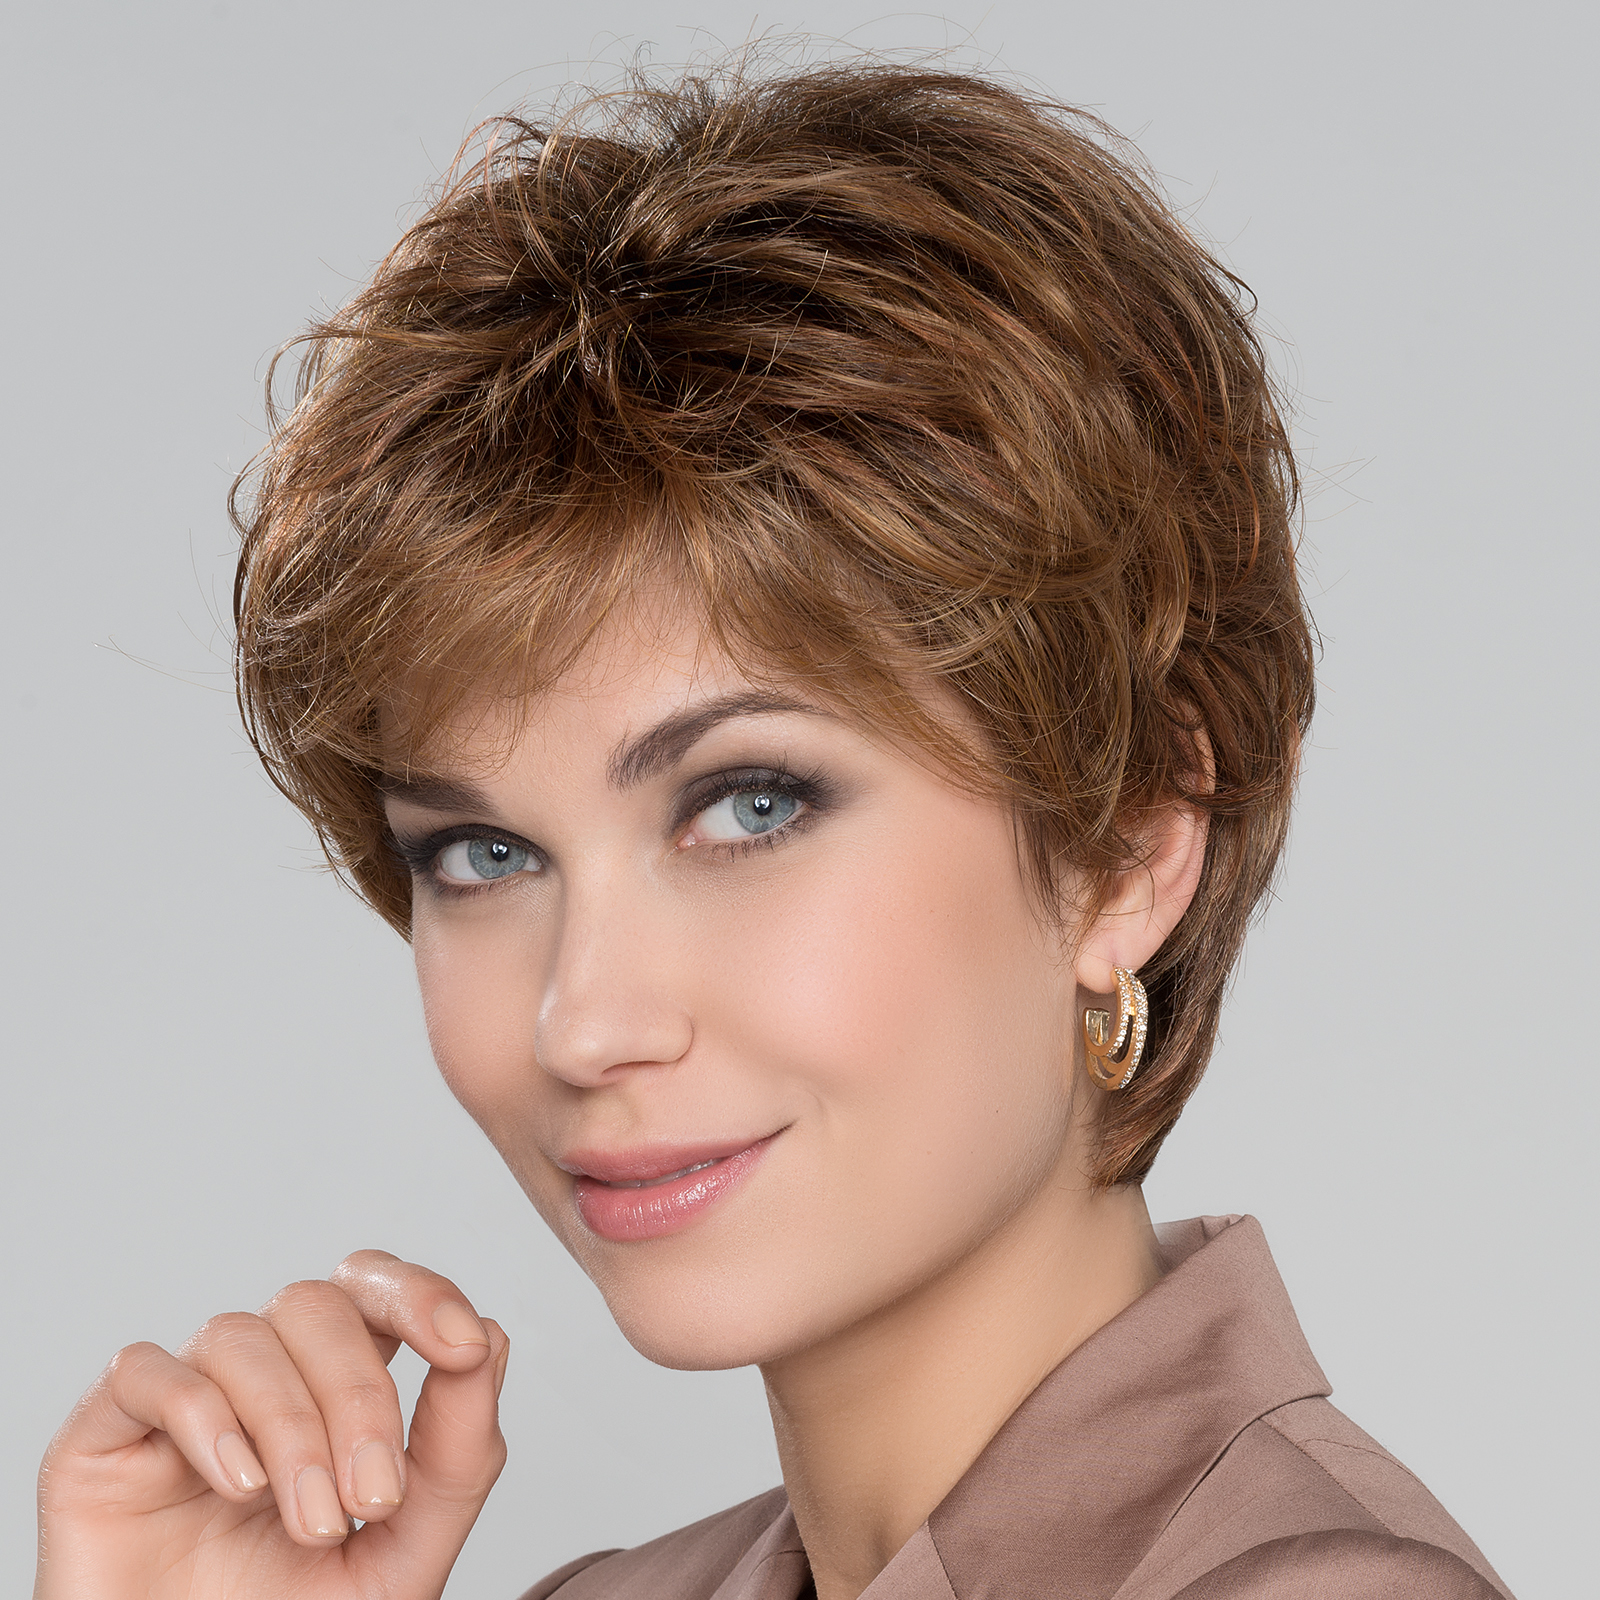 Paruka Cora ++ Hairpower - Aloena.cz - Paruky Ostrava 48c459237b